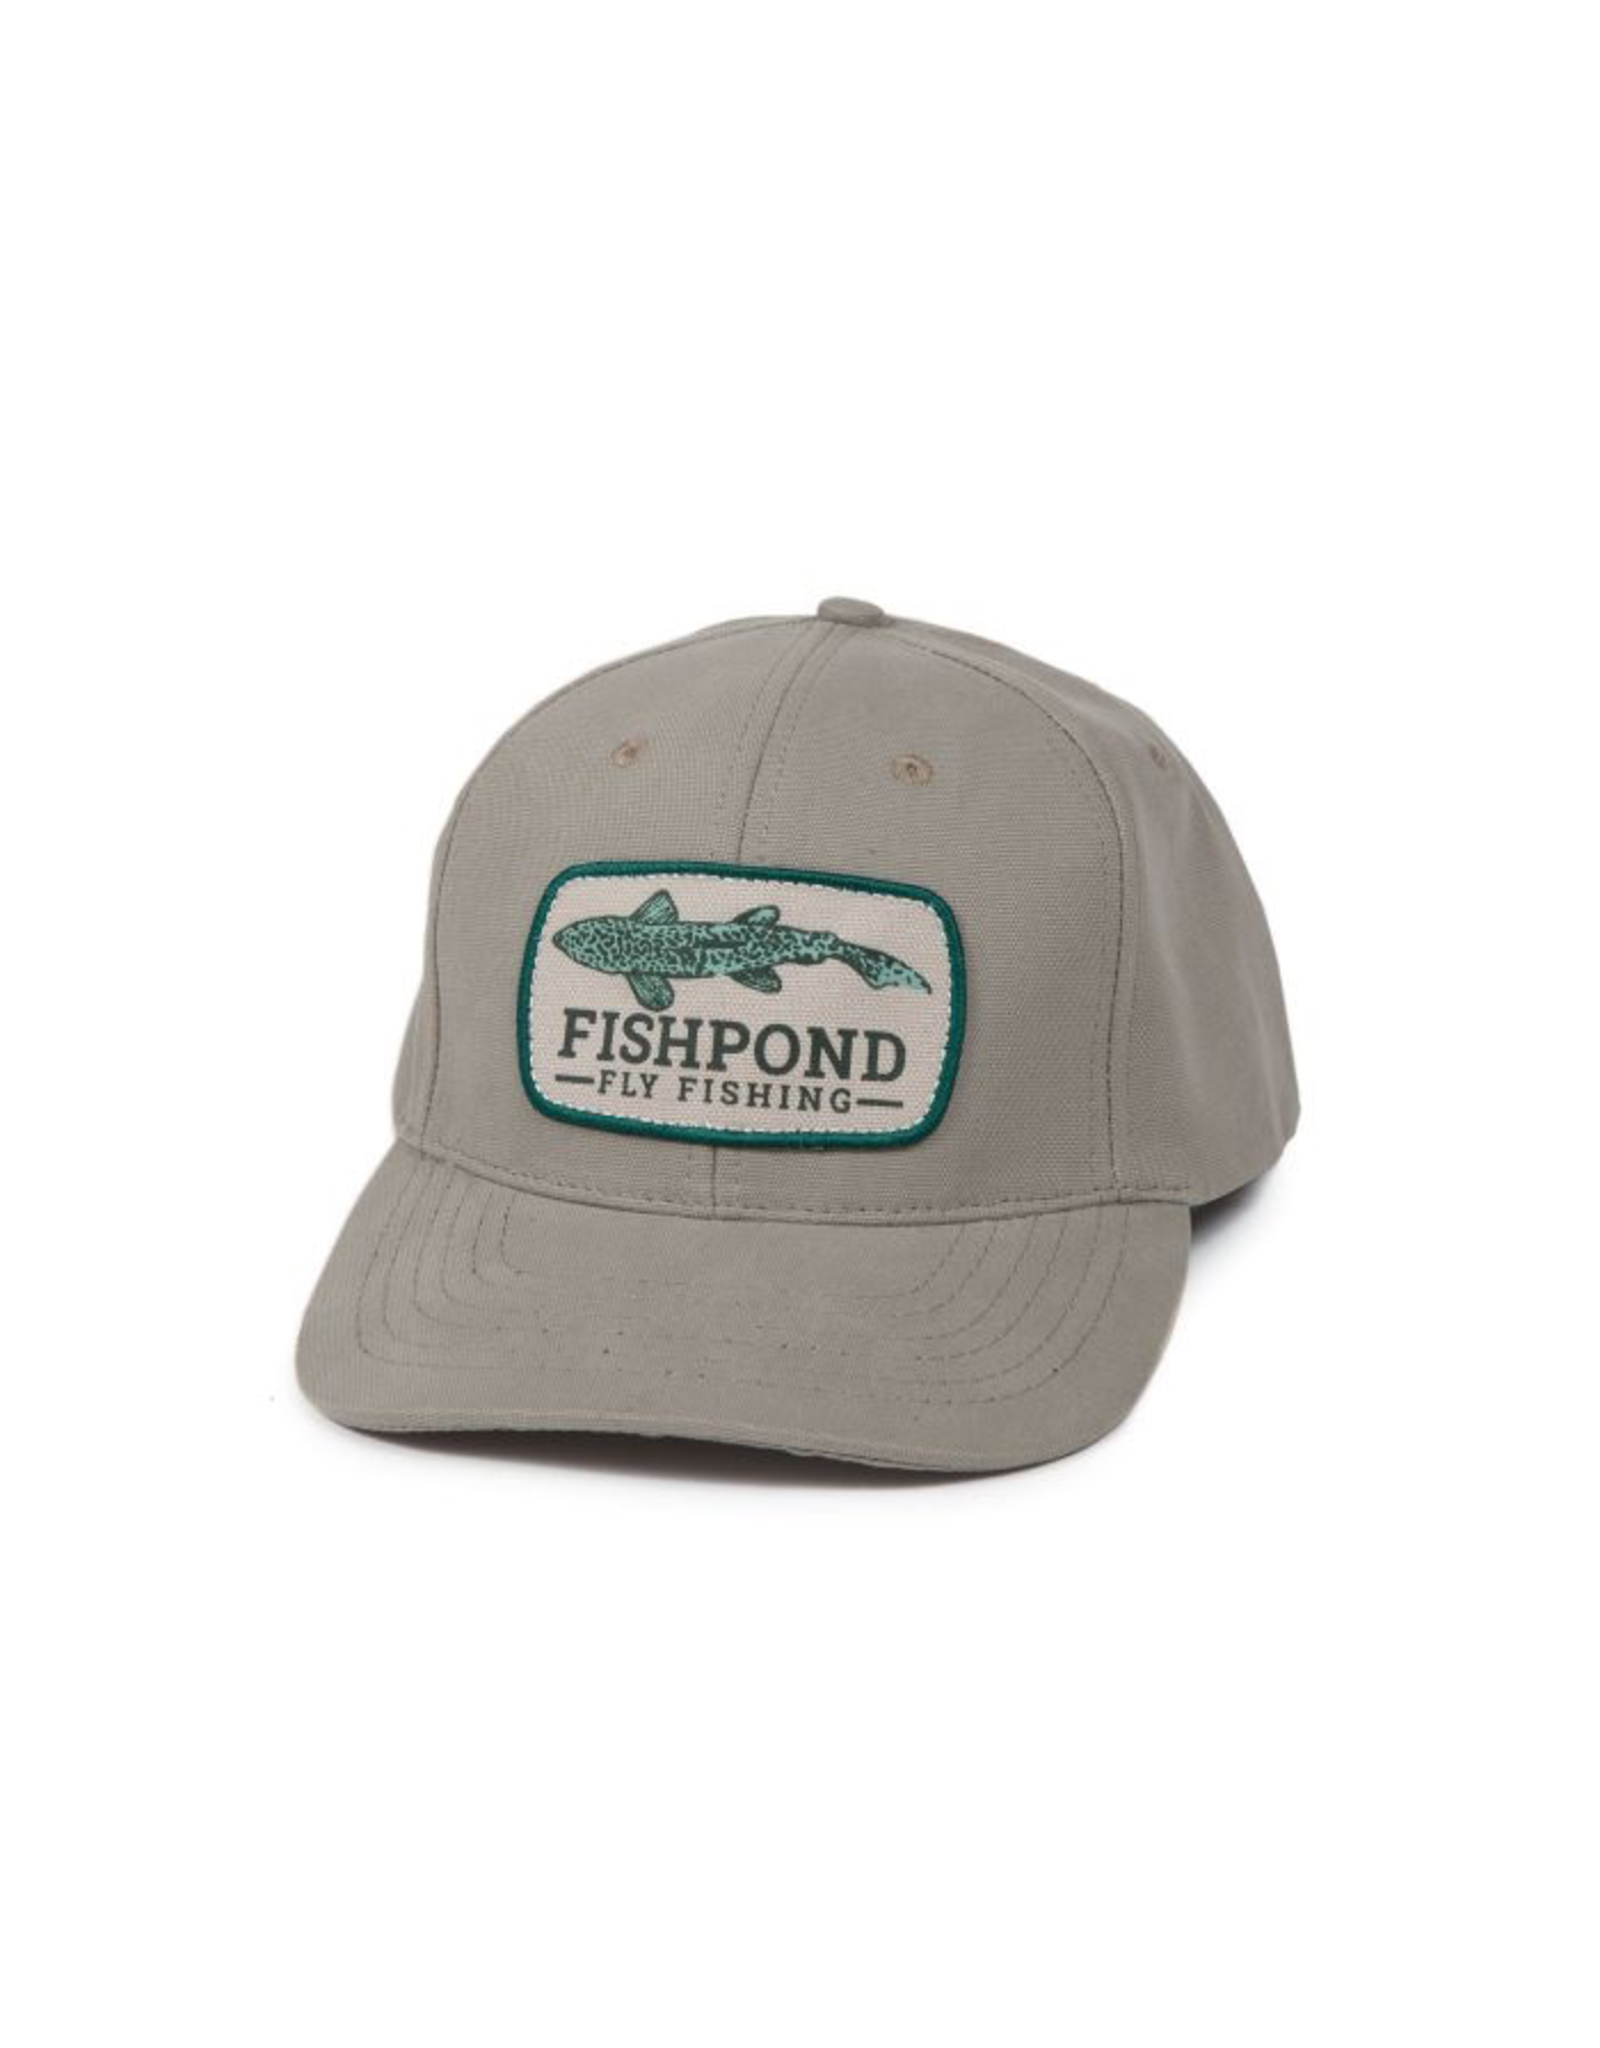 Fishpond Fishpond Cruiser Trout Hat